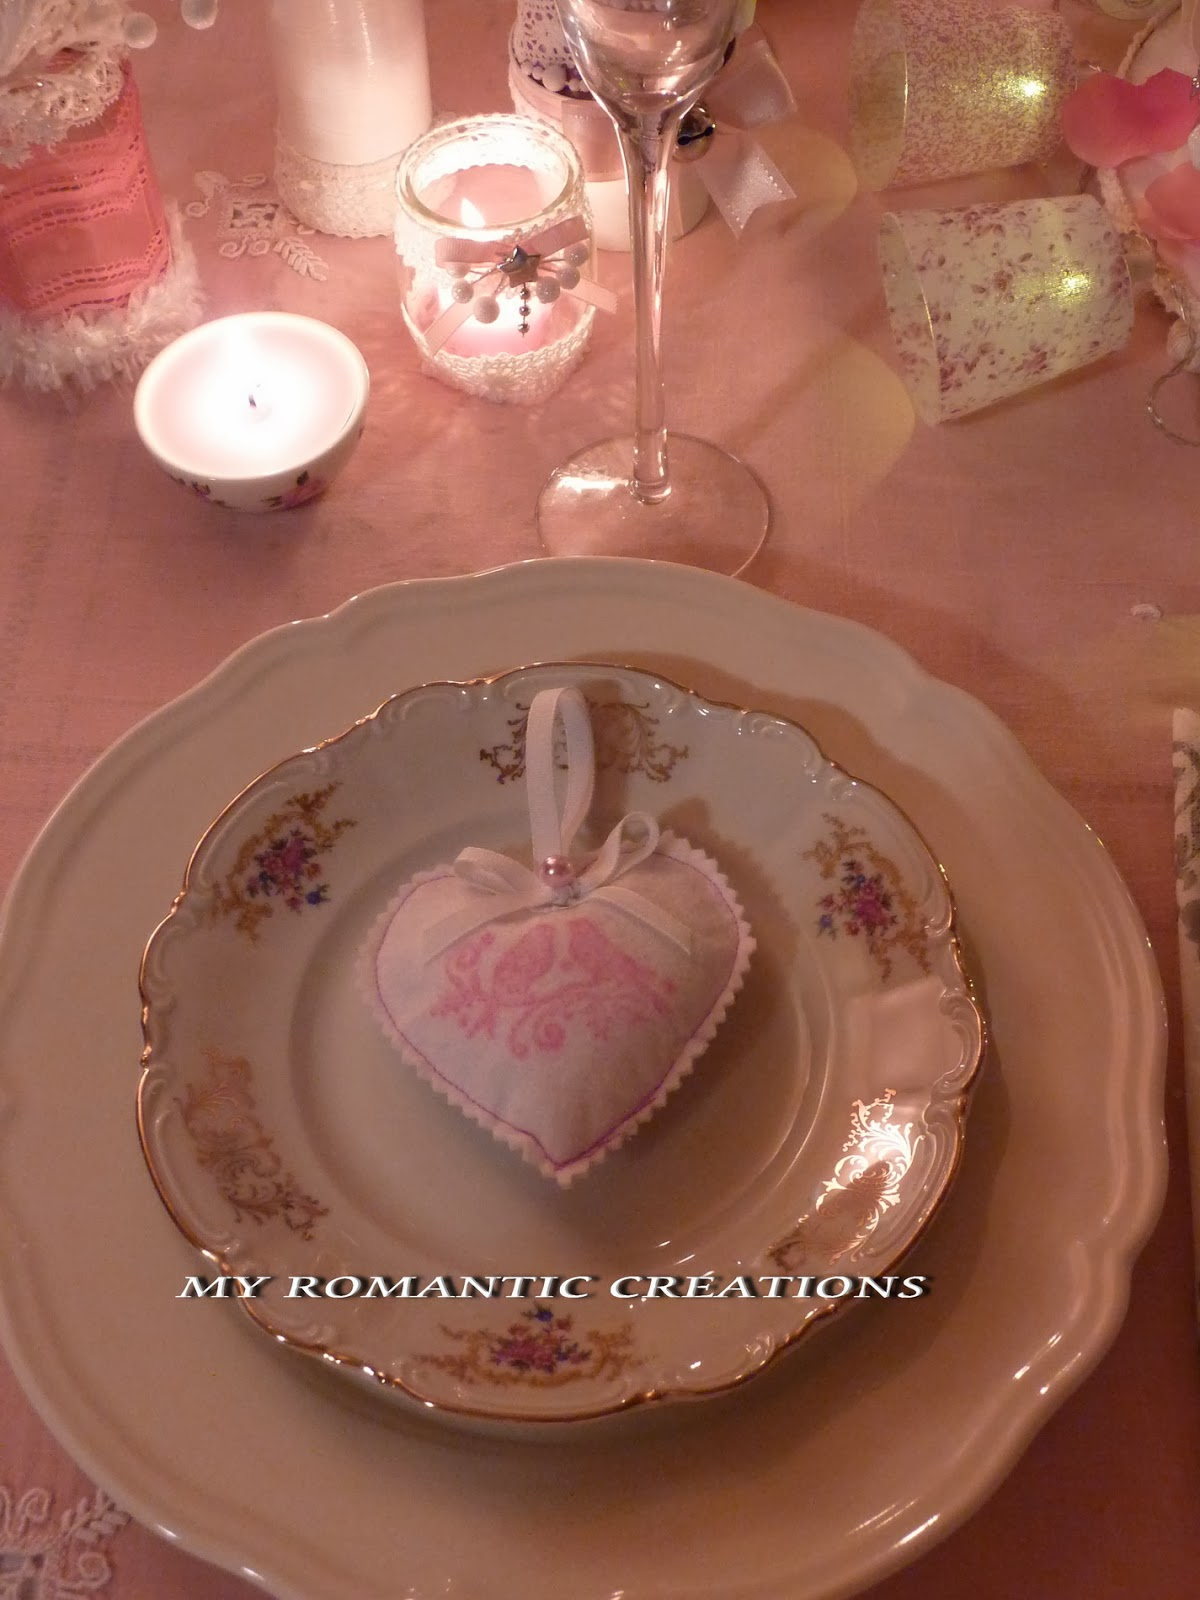 My Romantic Creations: dicembre 2013